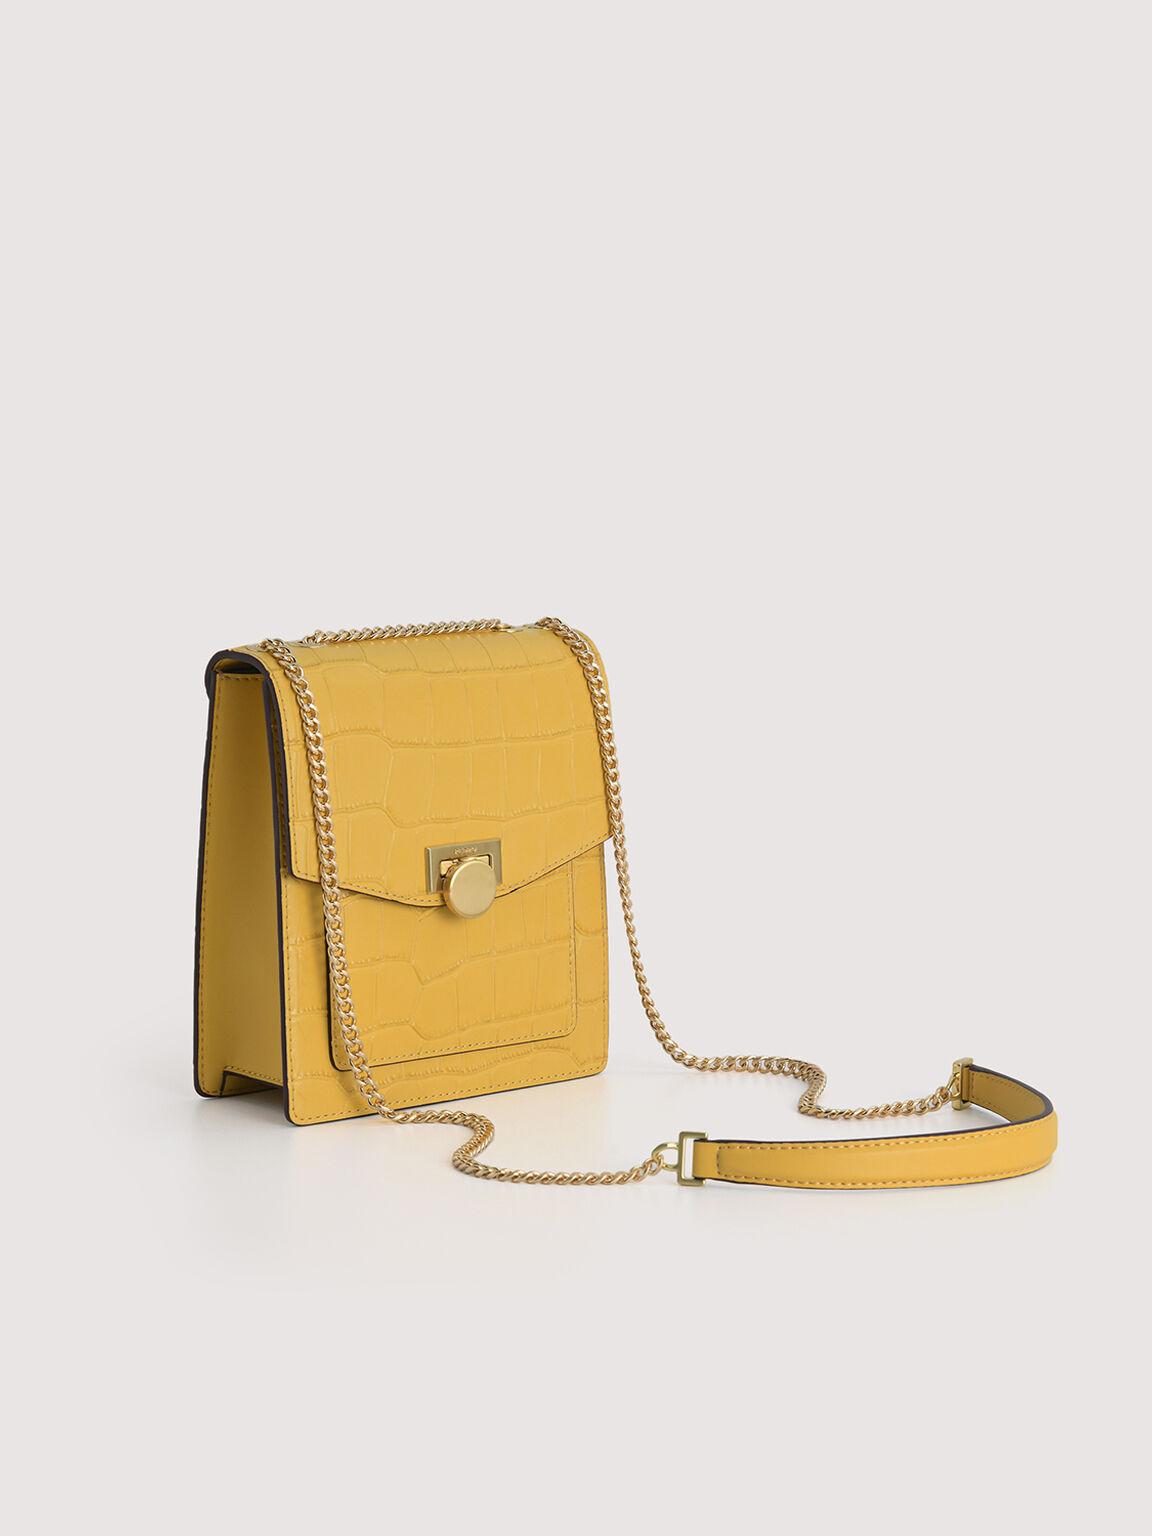 Croc-Effect Leather Shoulder Bag, Yellow, hi-res